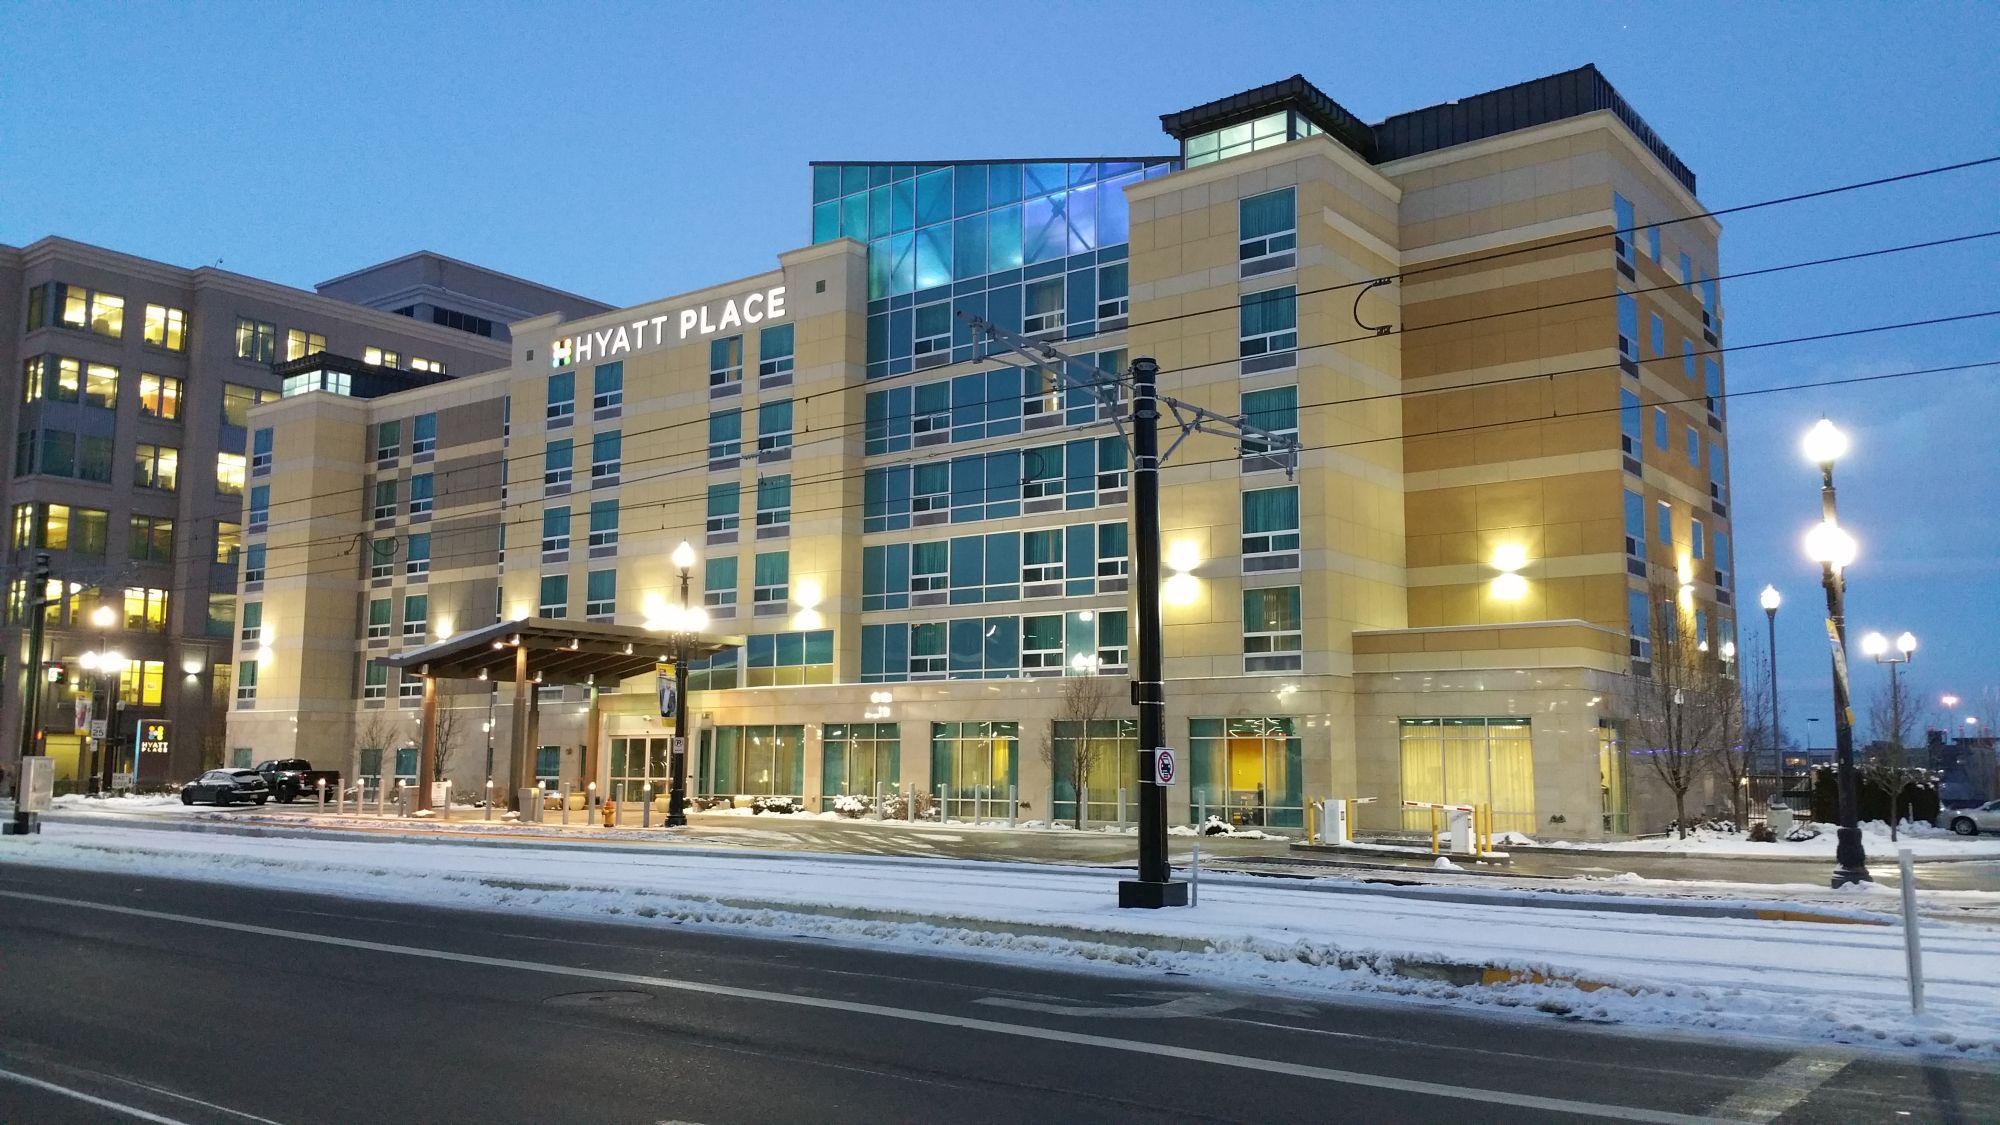 hotel review hyatt place salt lake city downtown the. Black Bedroom Furniture Sets. Home Design Ideas